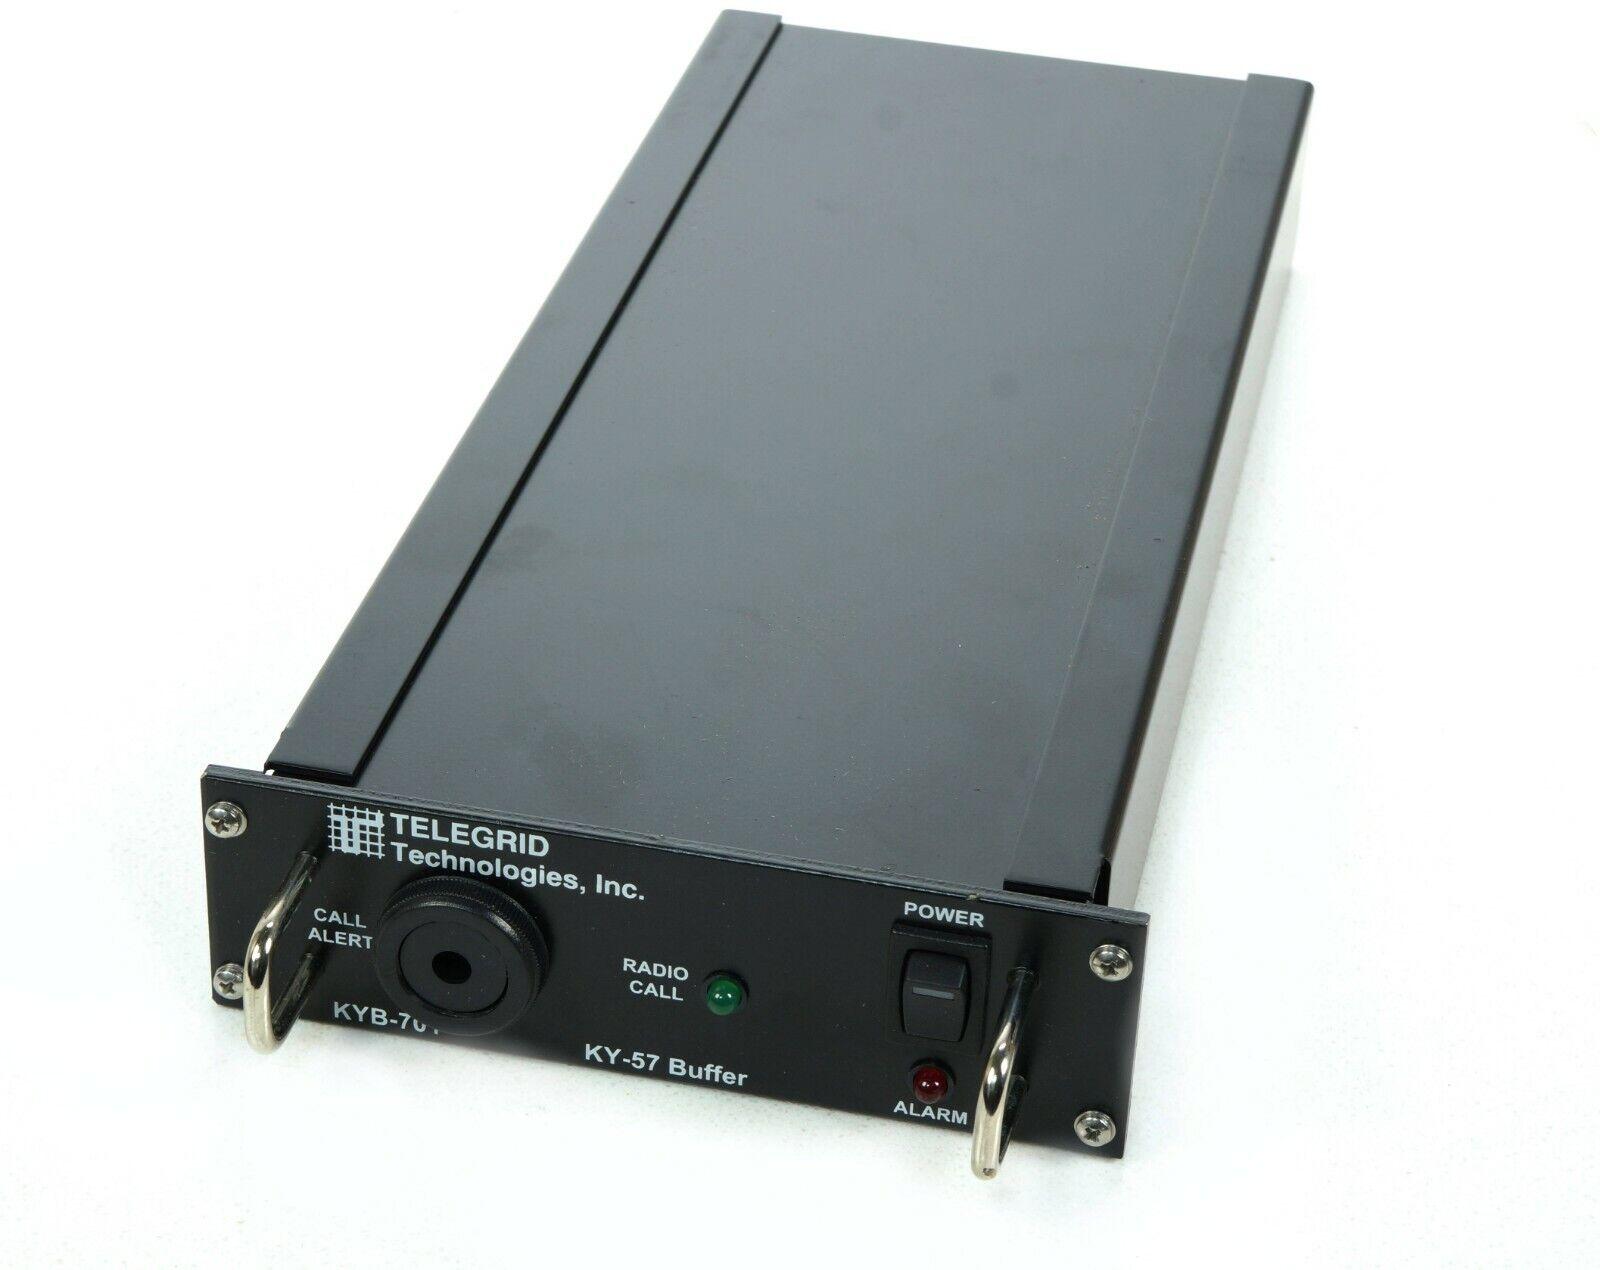 Telegrid KYB-701